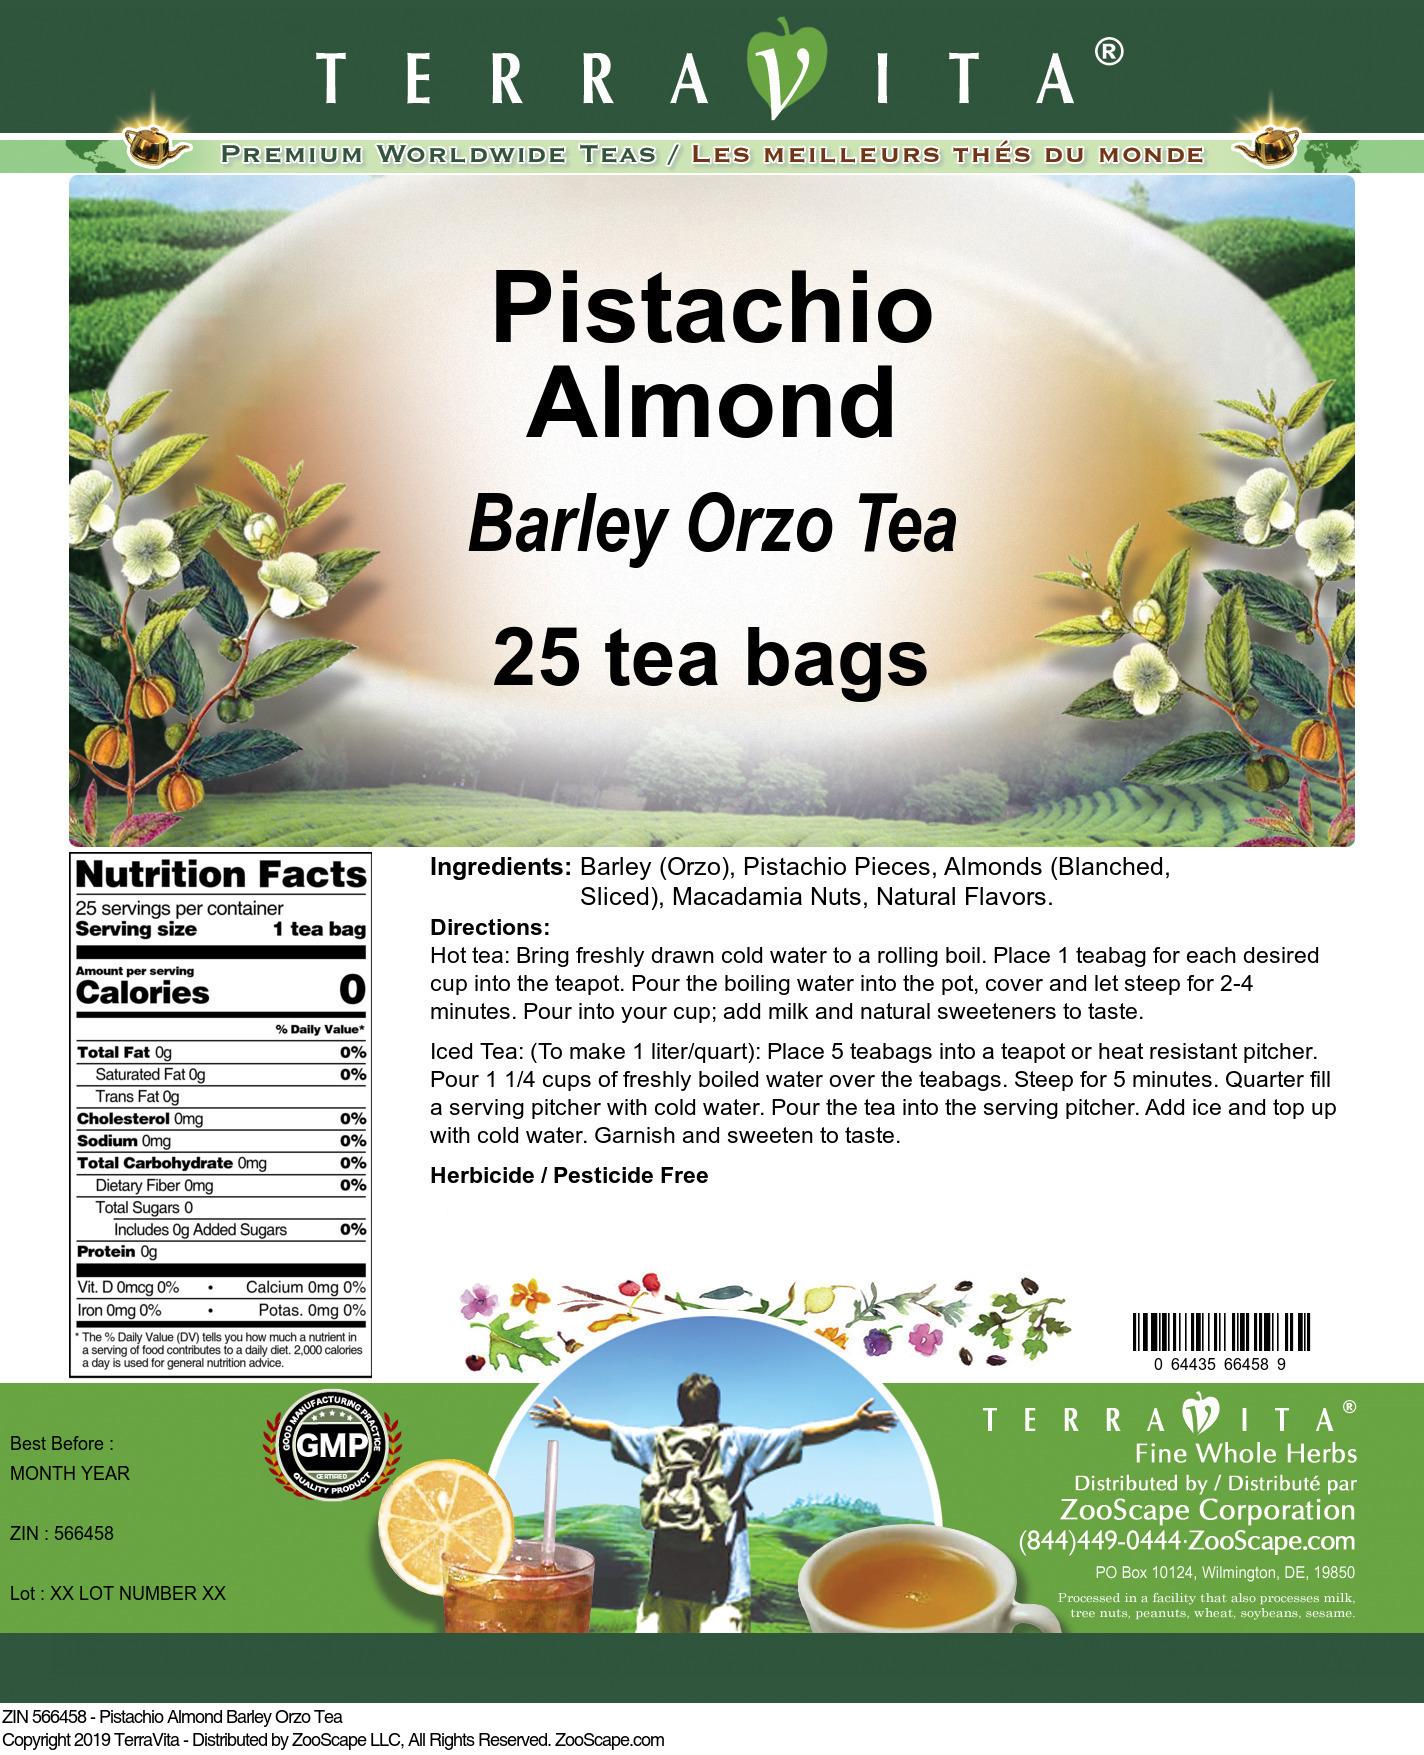 Pistachio Almond Barley Orzo